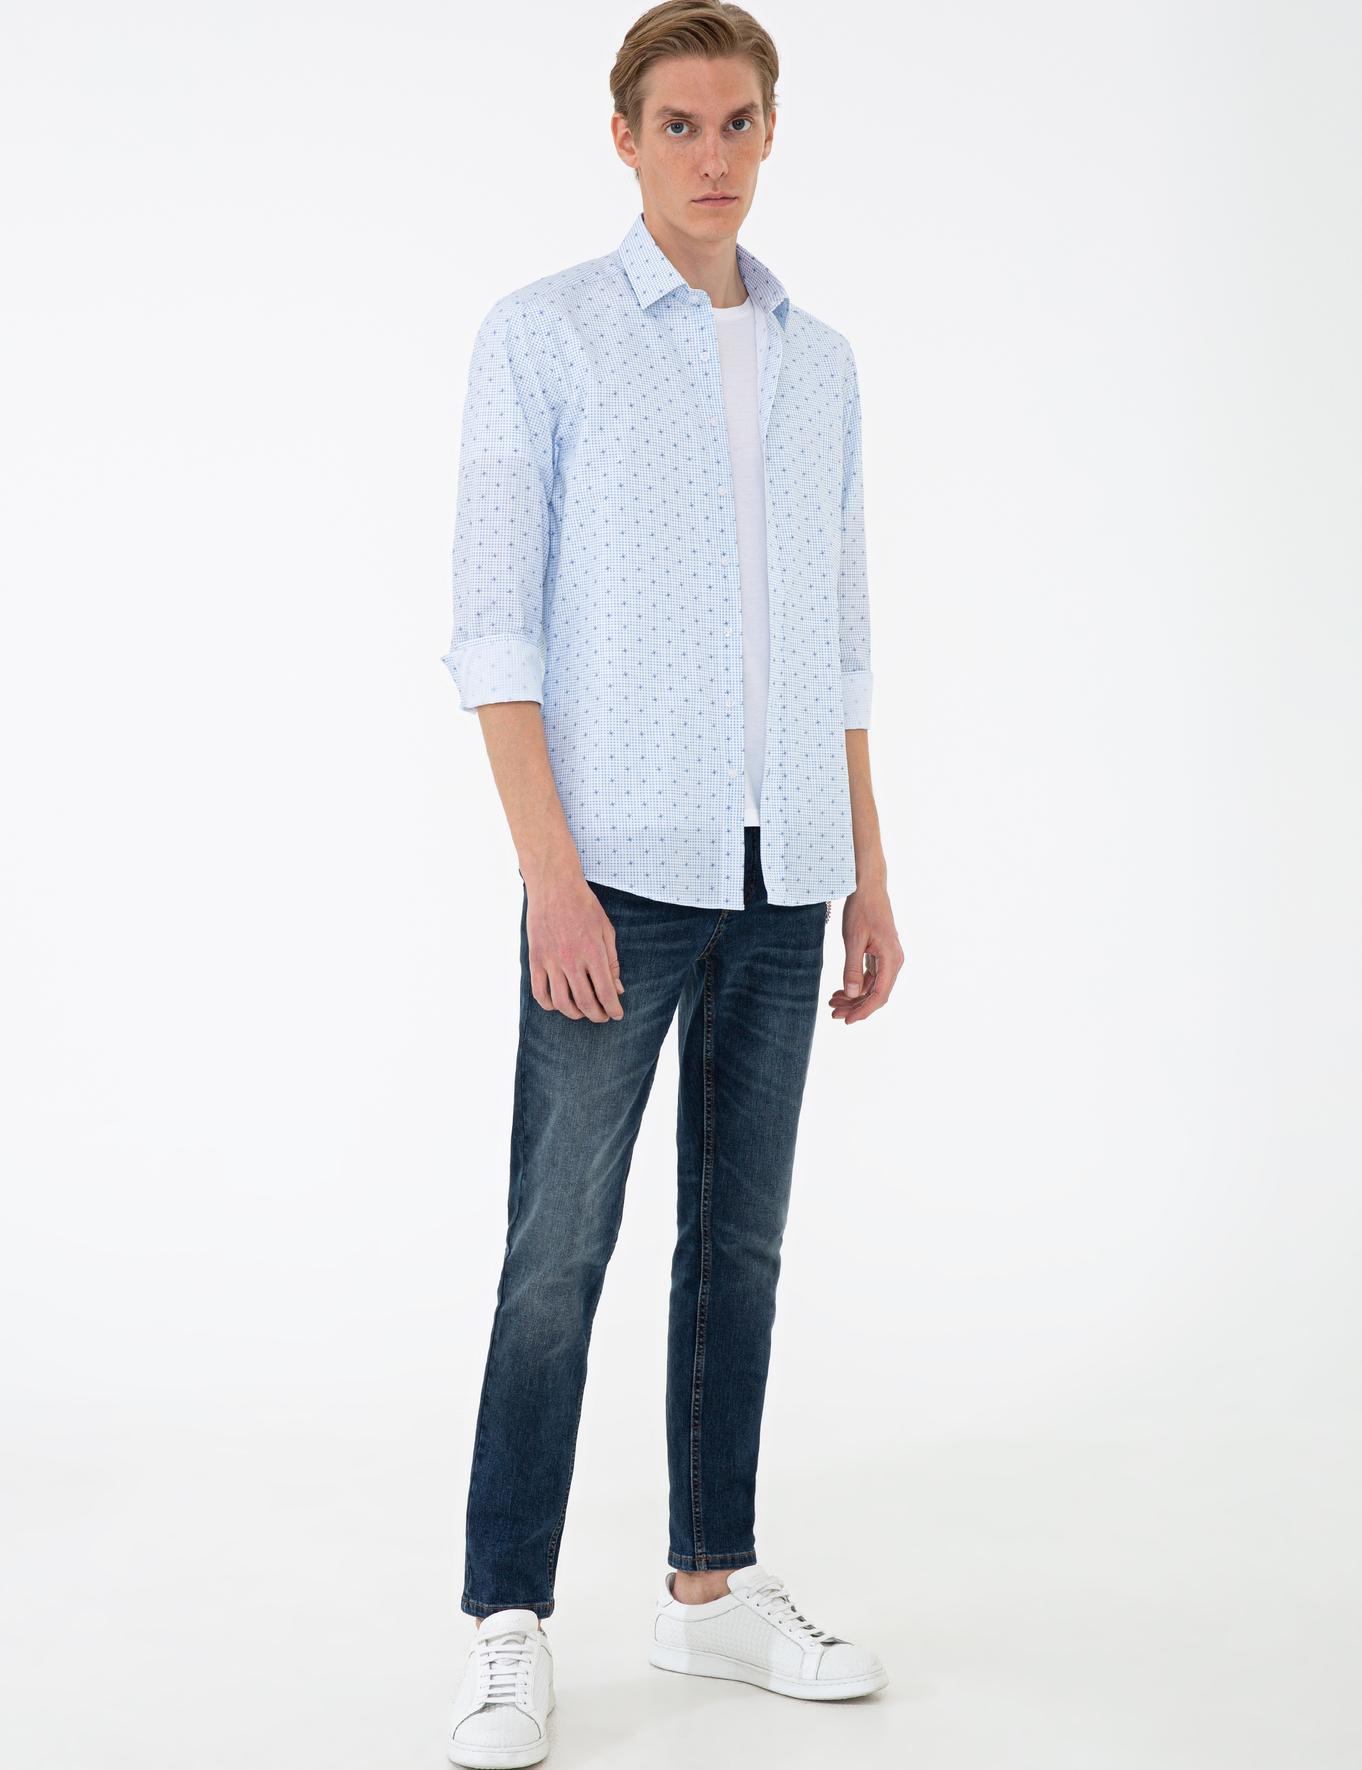 Lacivert Slim Fit Gömlek - 50235103006